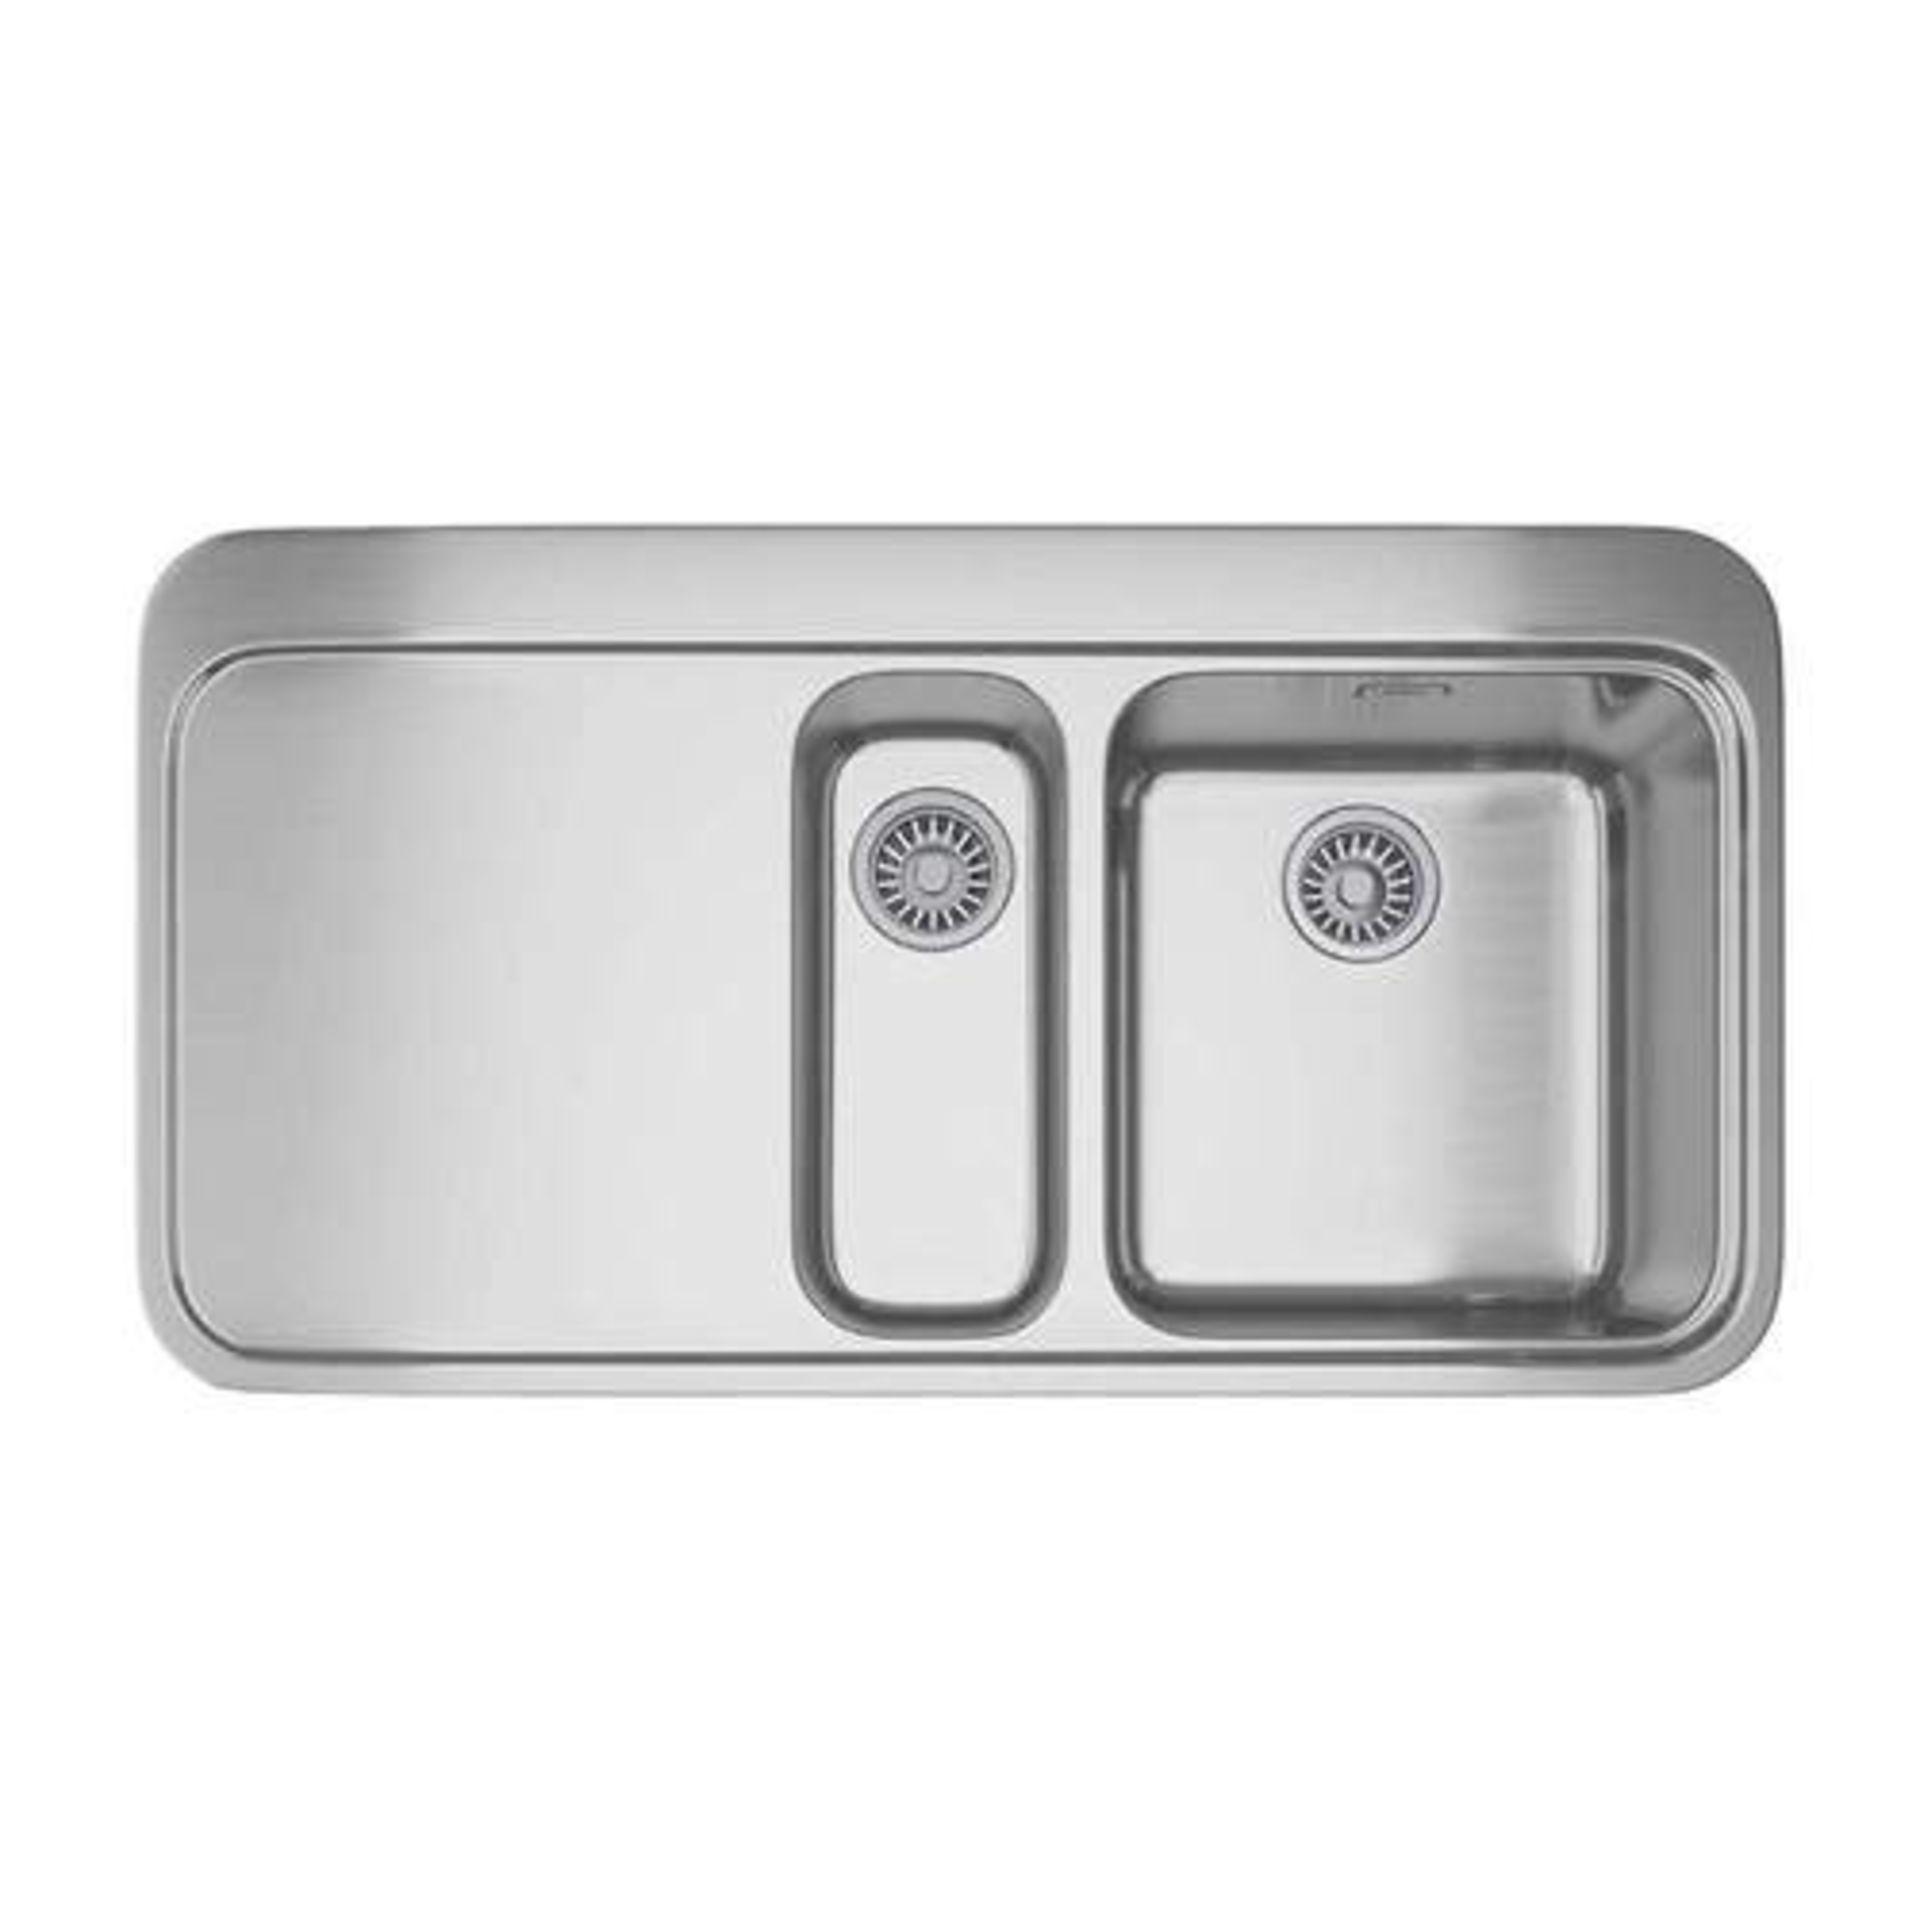 NEW (REF31) Franke Sinos SNX 251 Left Handed Stainless Steel 1.5 Bowl Inset Sink | 127.0364.684. RRP